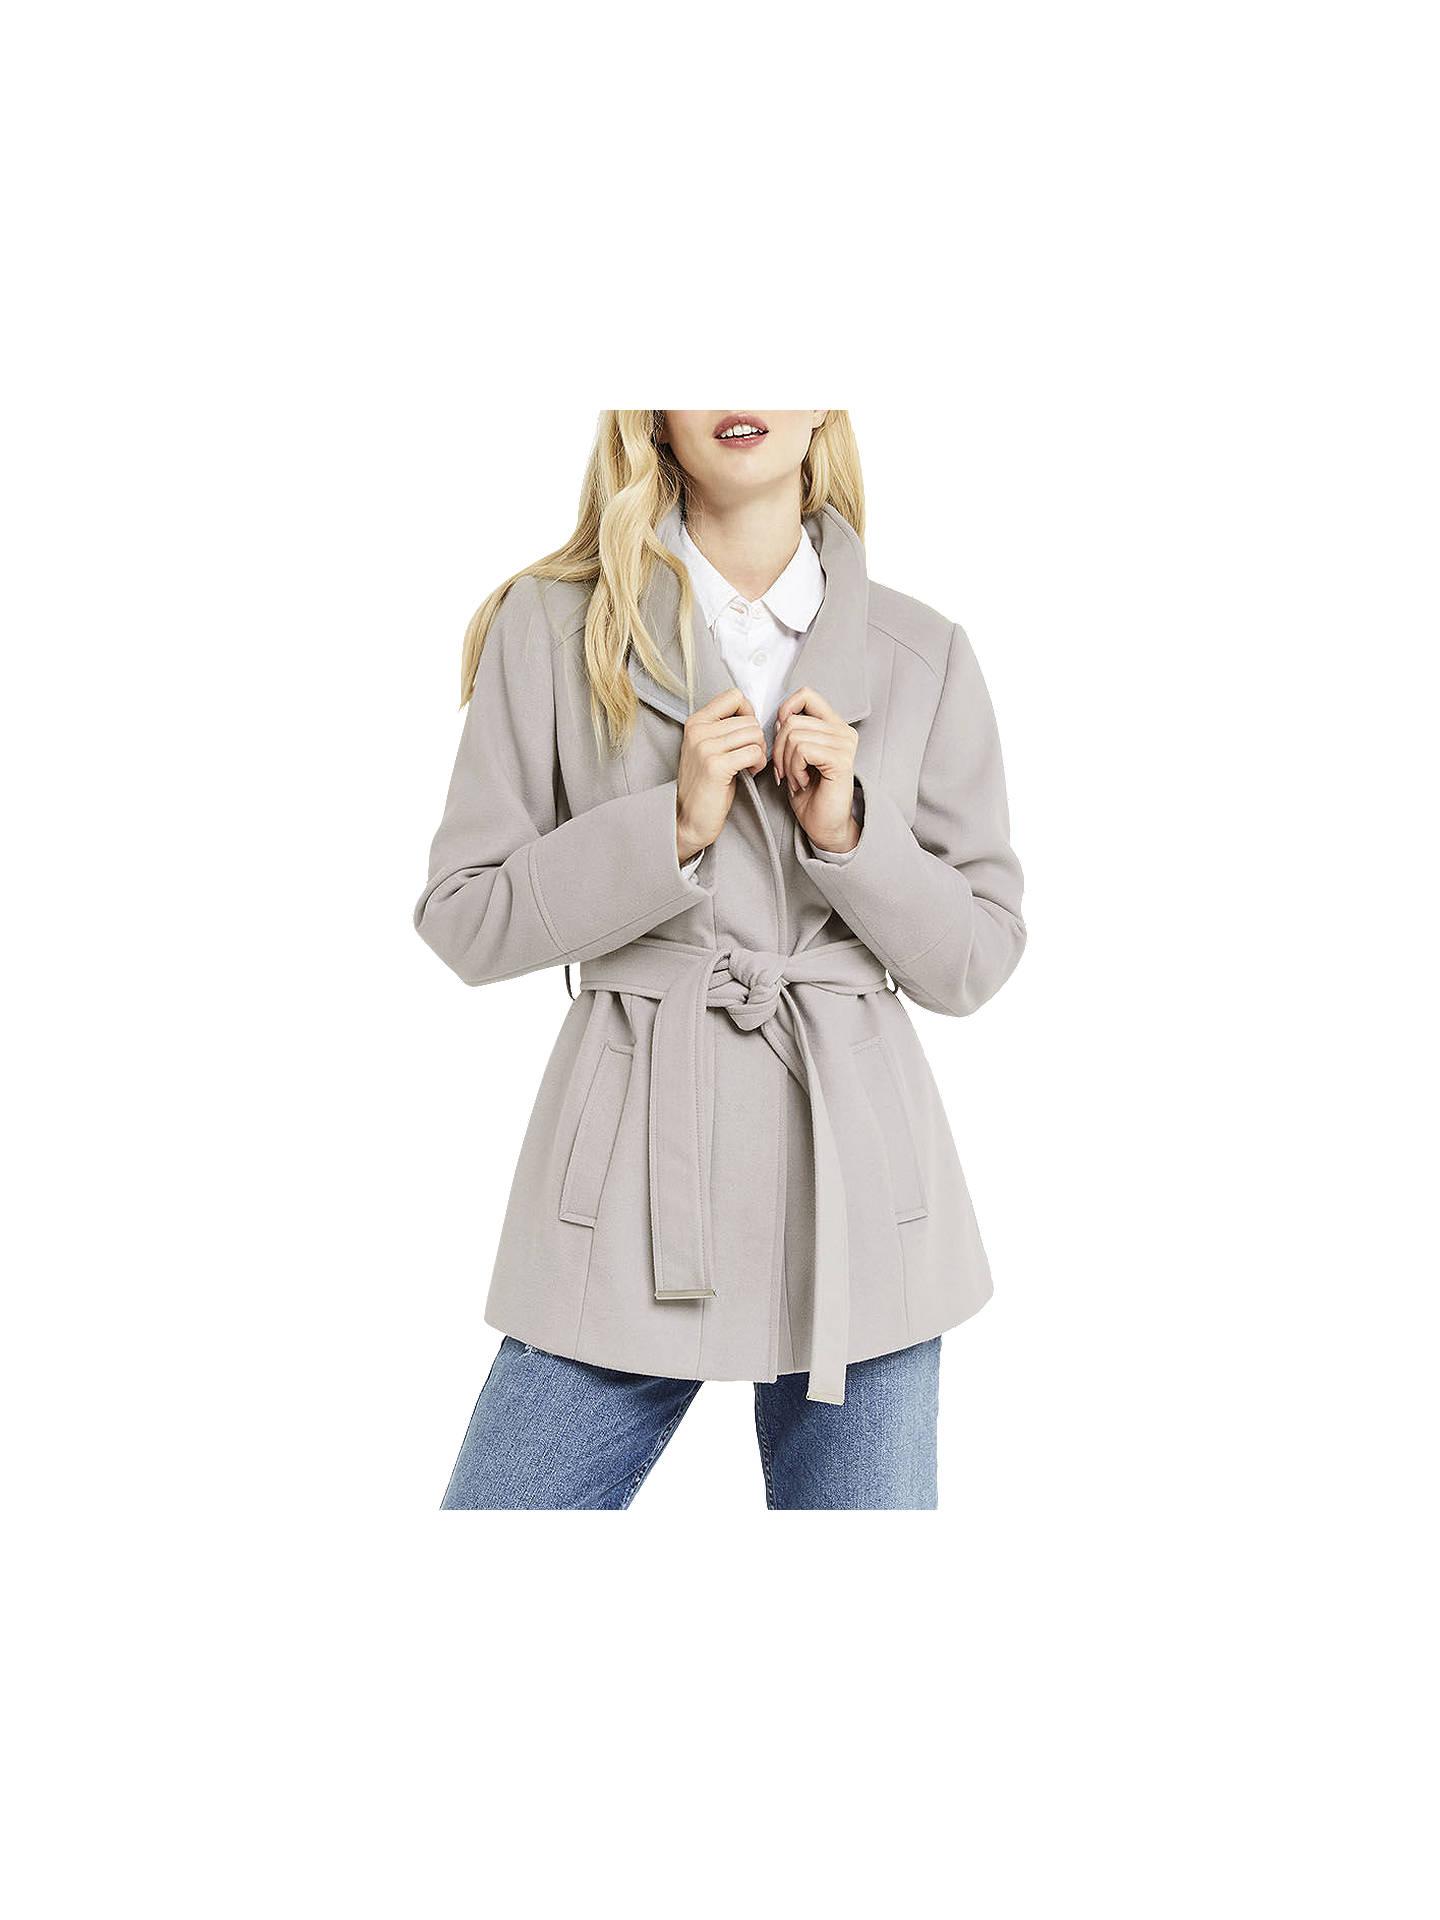 59c4c95434dc Buy Oasis Short Leah Funnel Coat, Mid Grey, XS Online at johnlewis.com ...